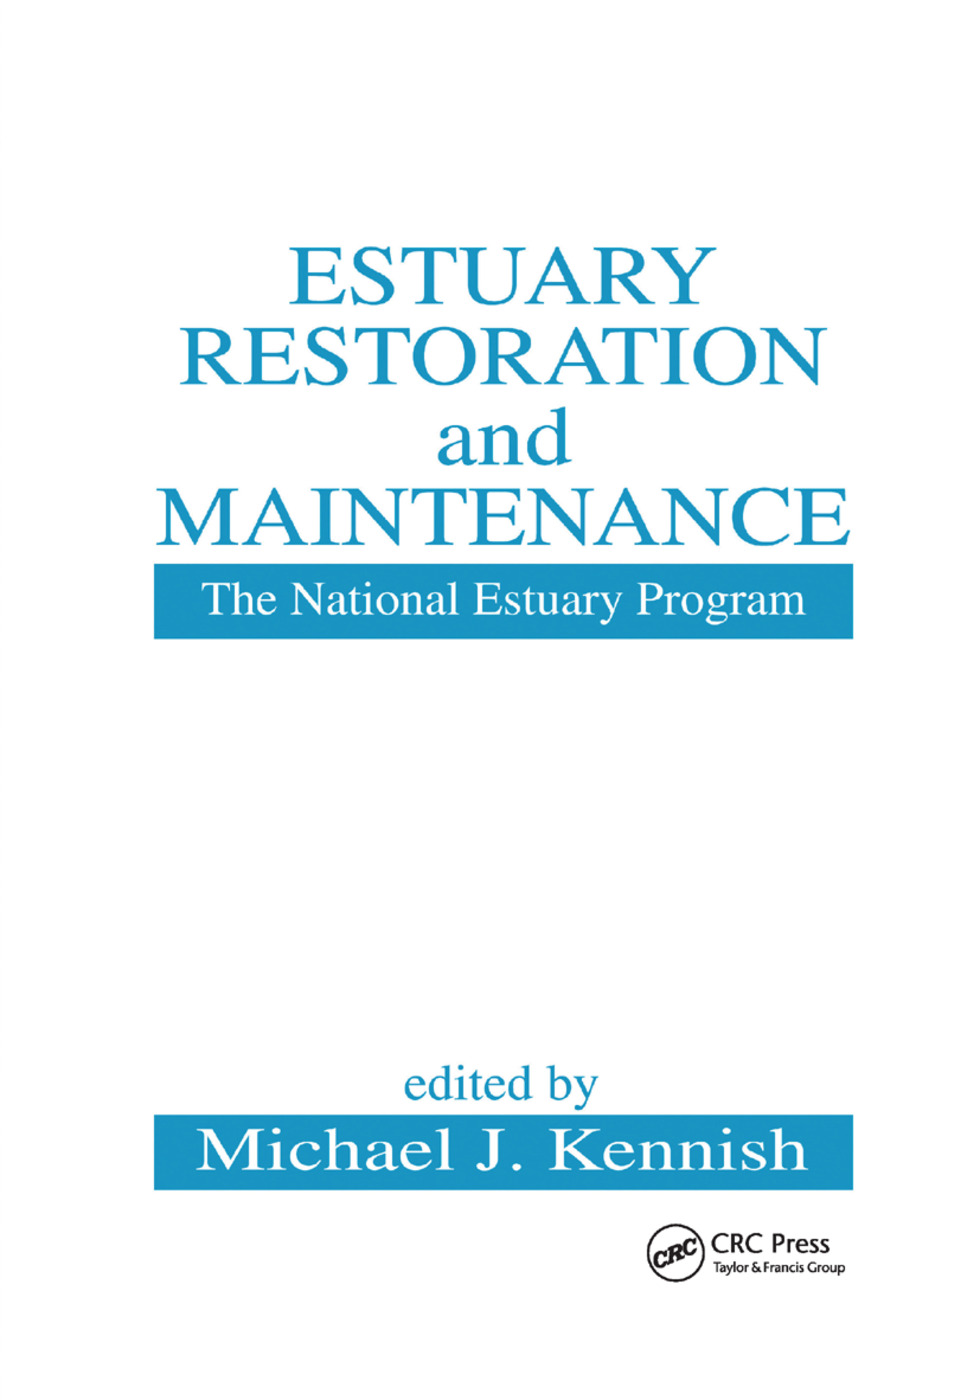 Estuary Restoration and Maintenance: The National Estuary Program, 1st Edition (Paperback) book cover